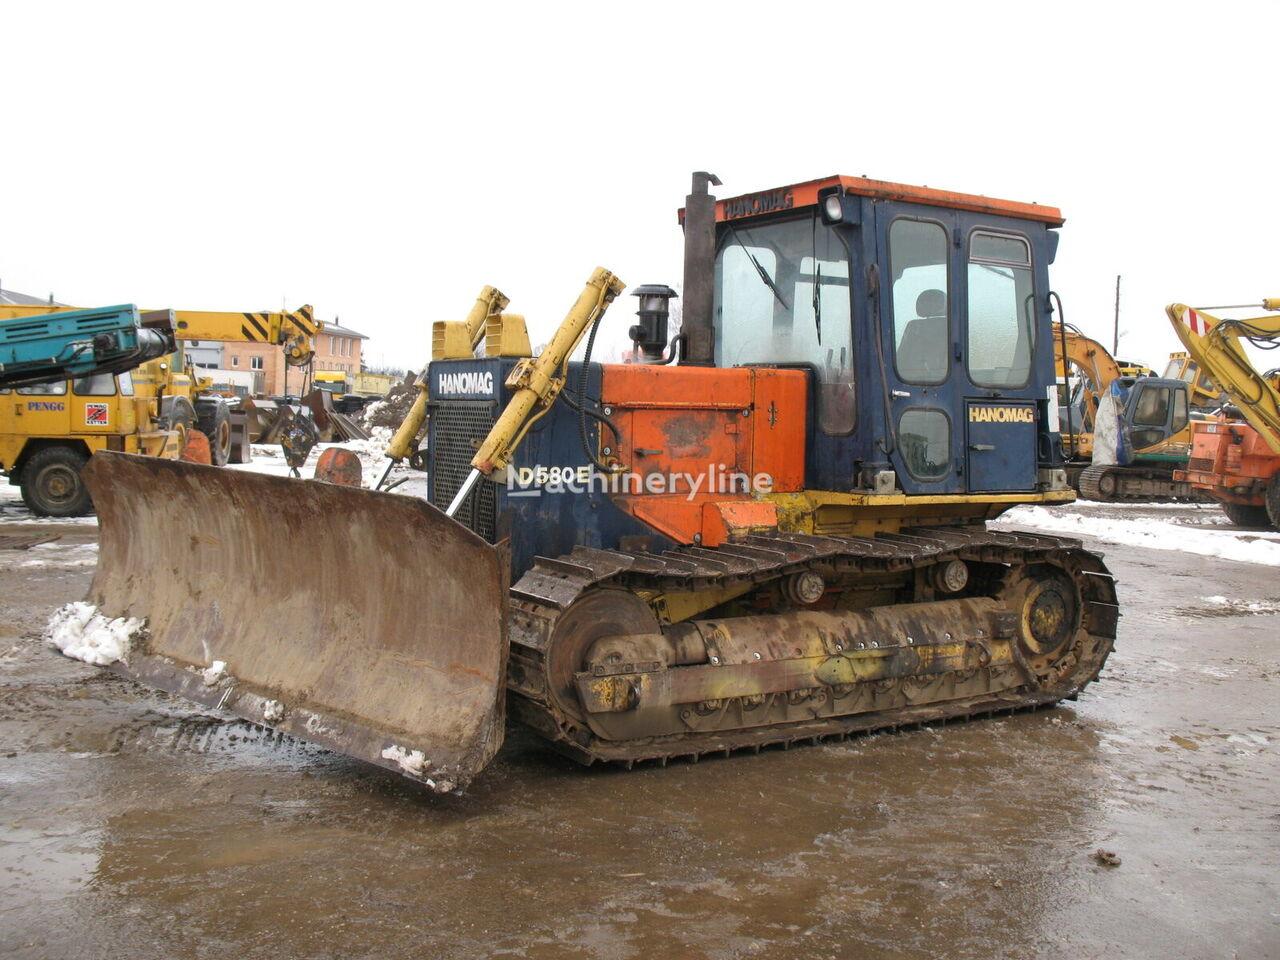 HANOMAG 580 buldozers